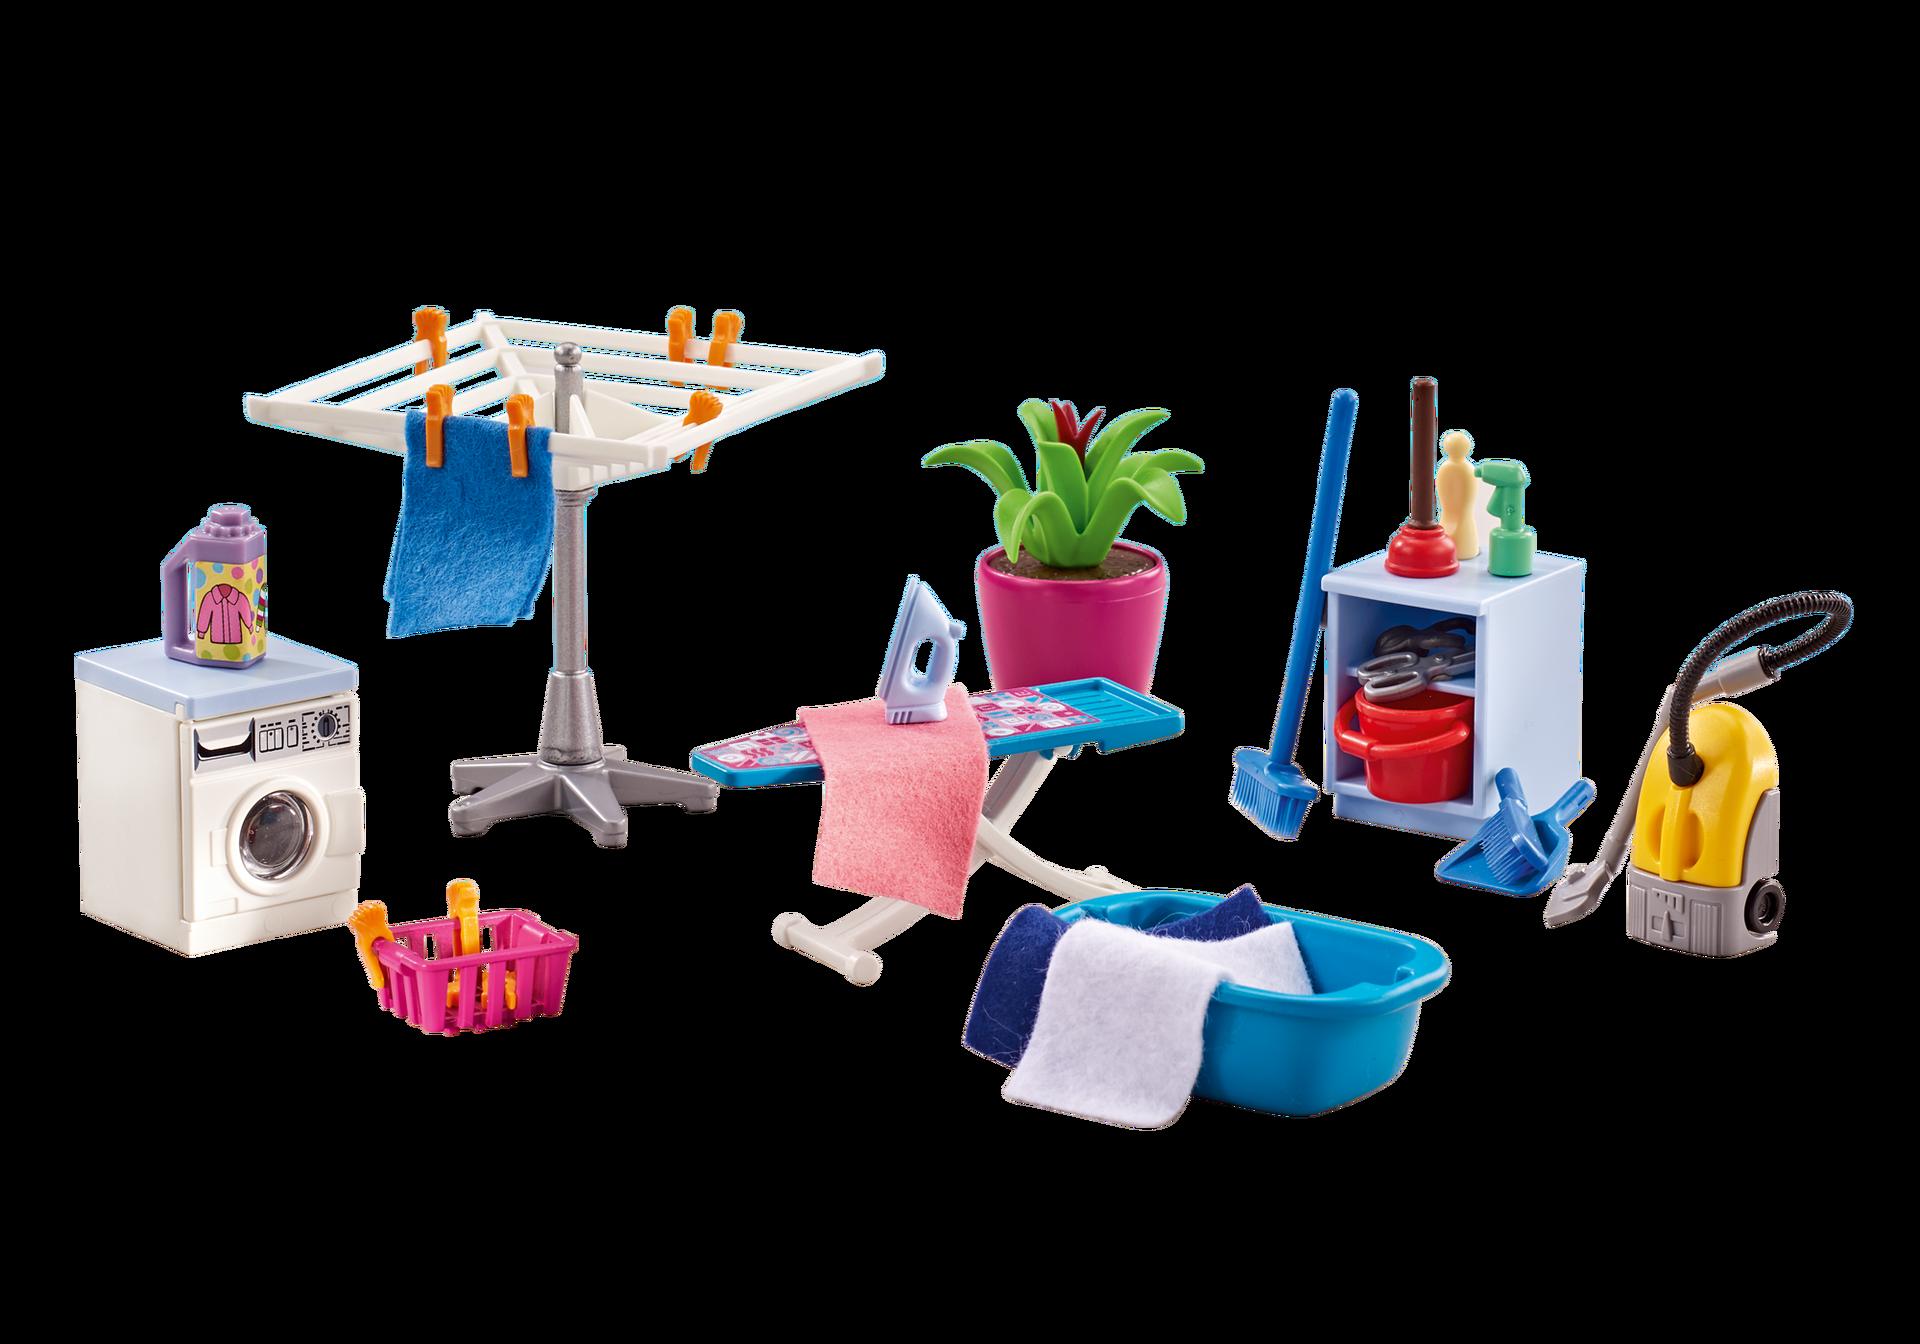 Playmobil Ausmalbilder Krankenhaus : Wunderbar Playmobil Aquapark Ausmalbilder Galerie Malvorlagen Von